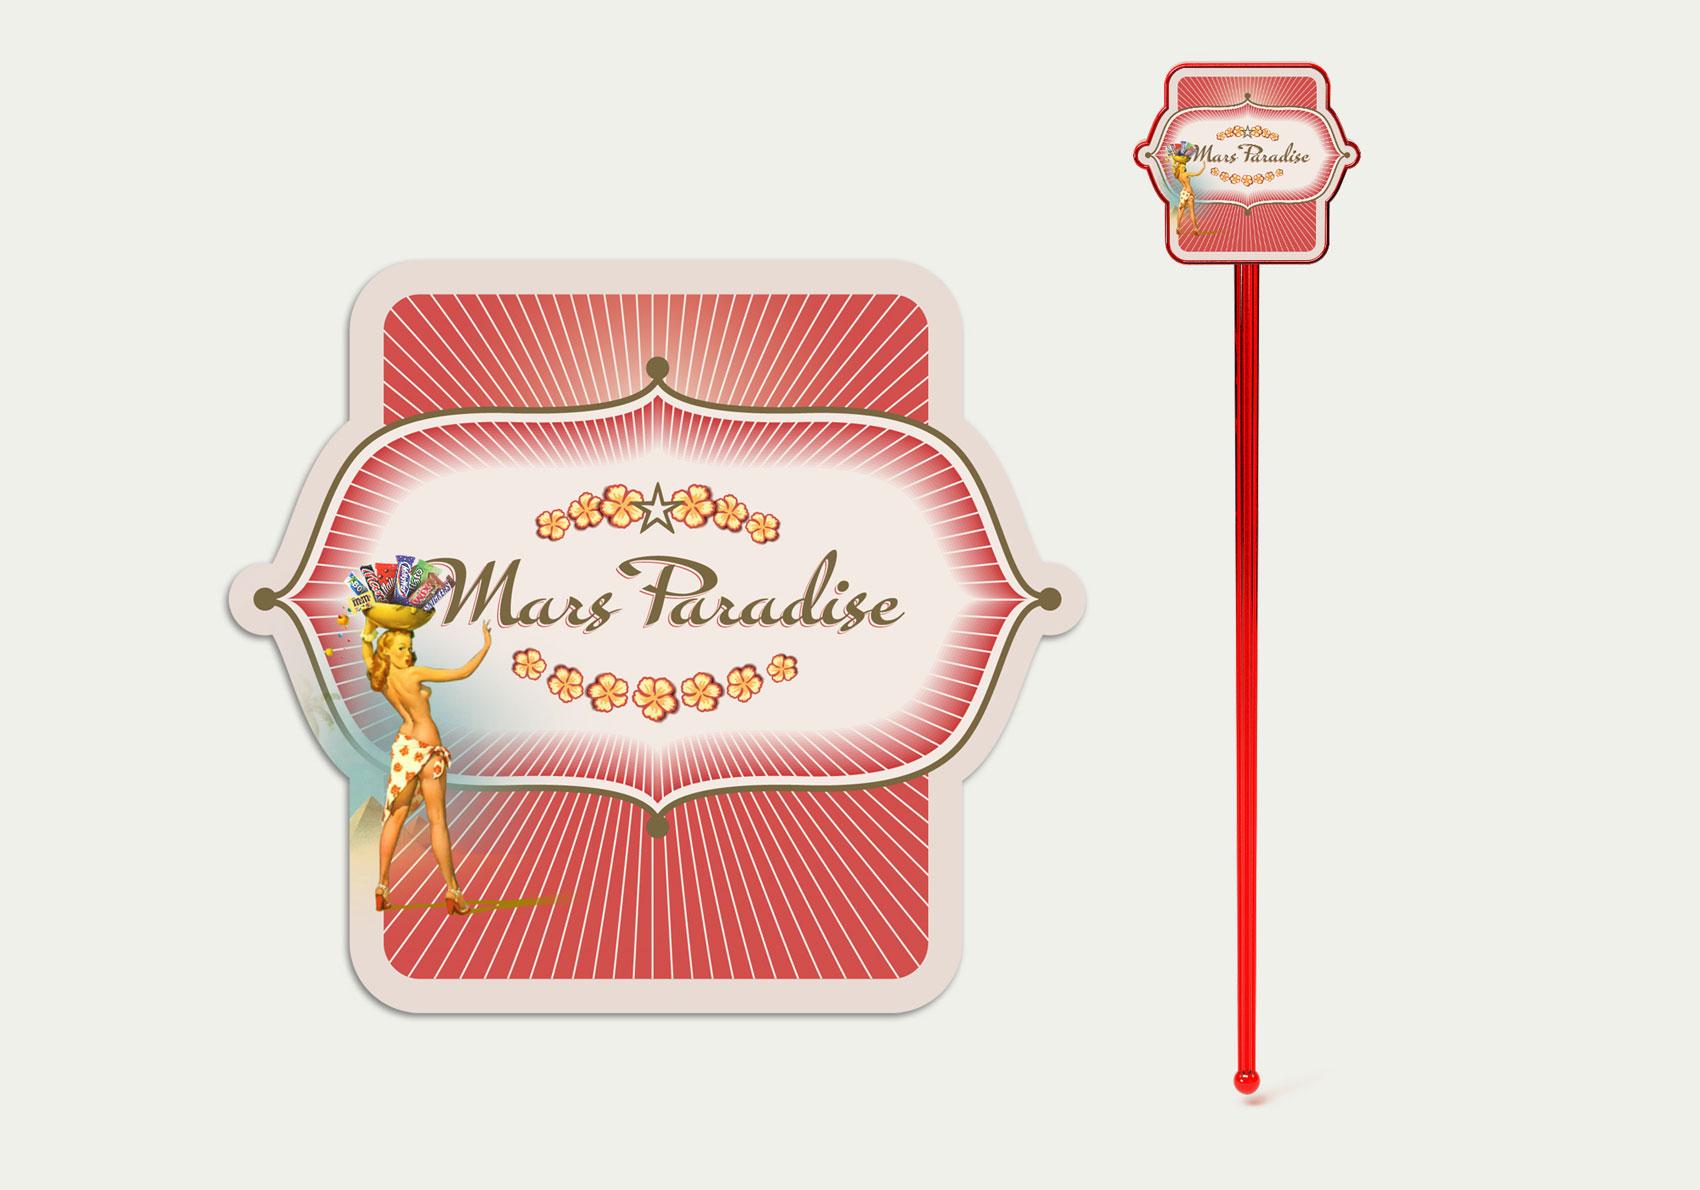 mars-paradise-2